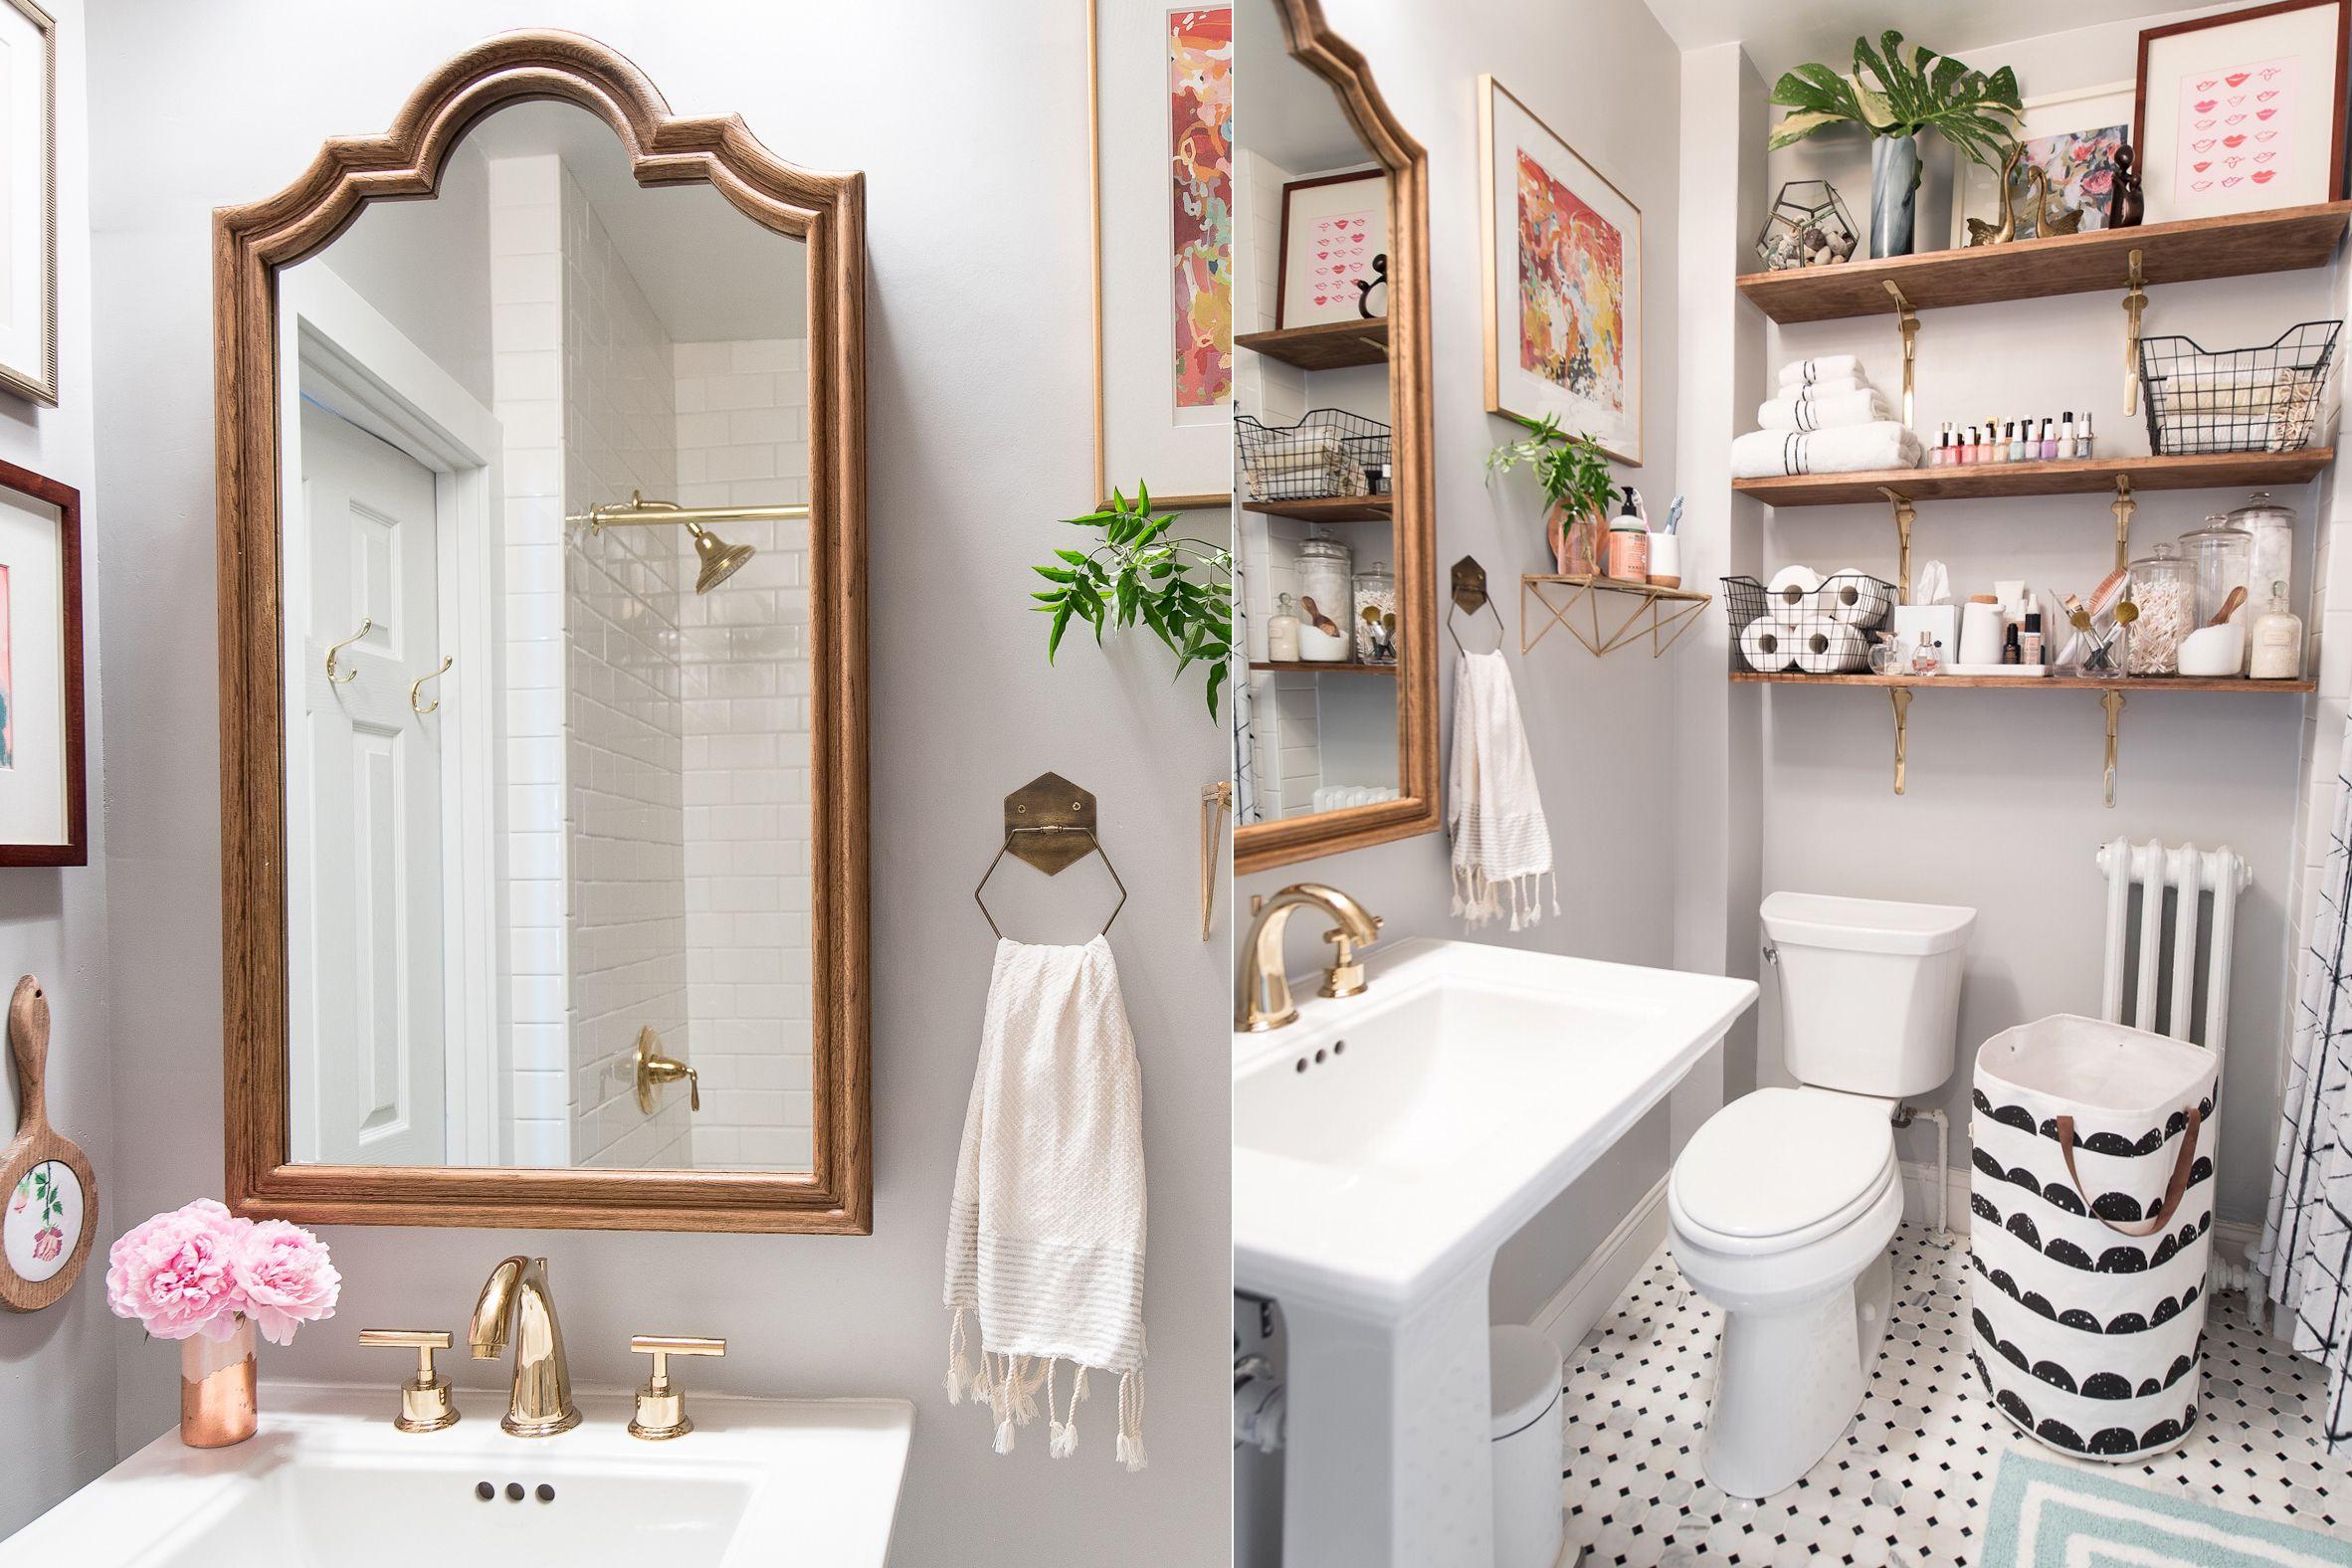 21 small bathroom decorating